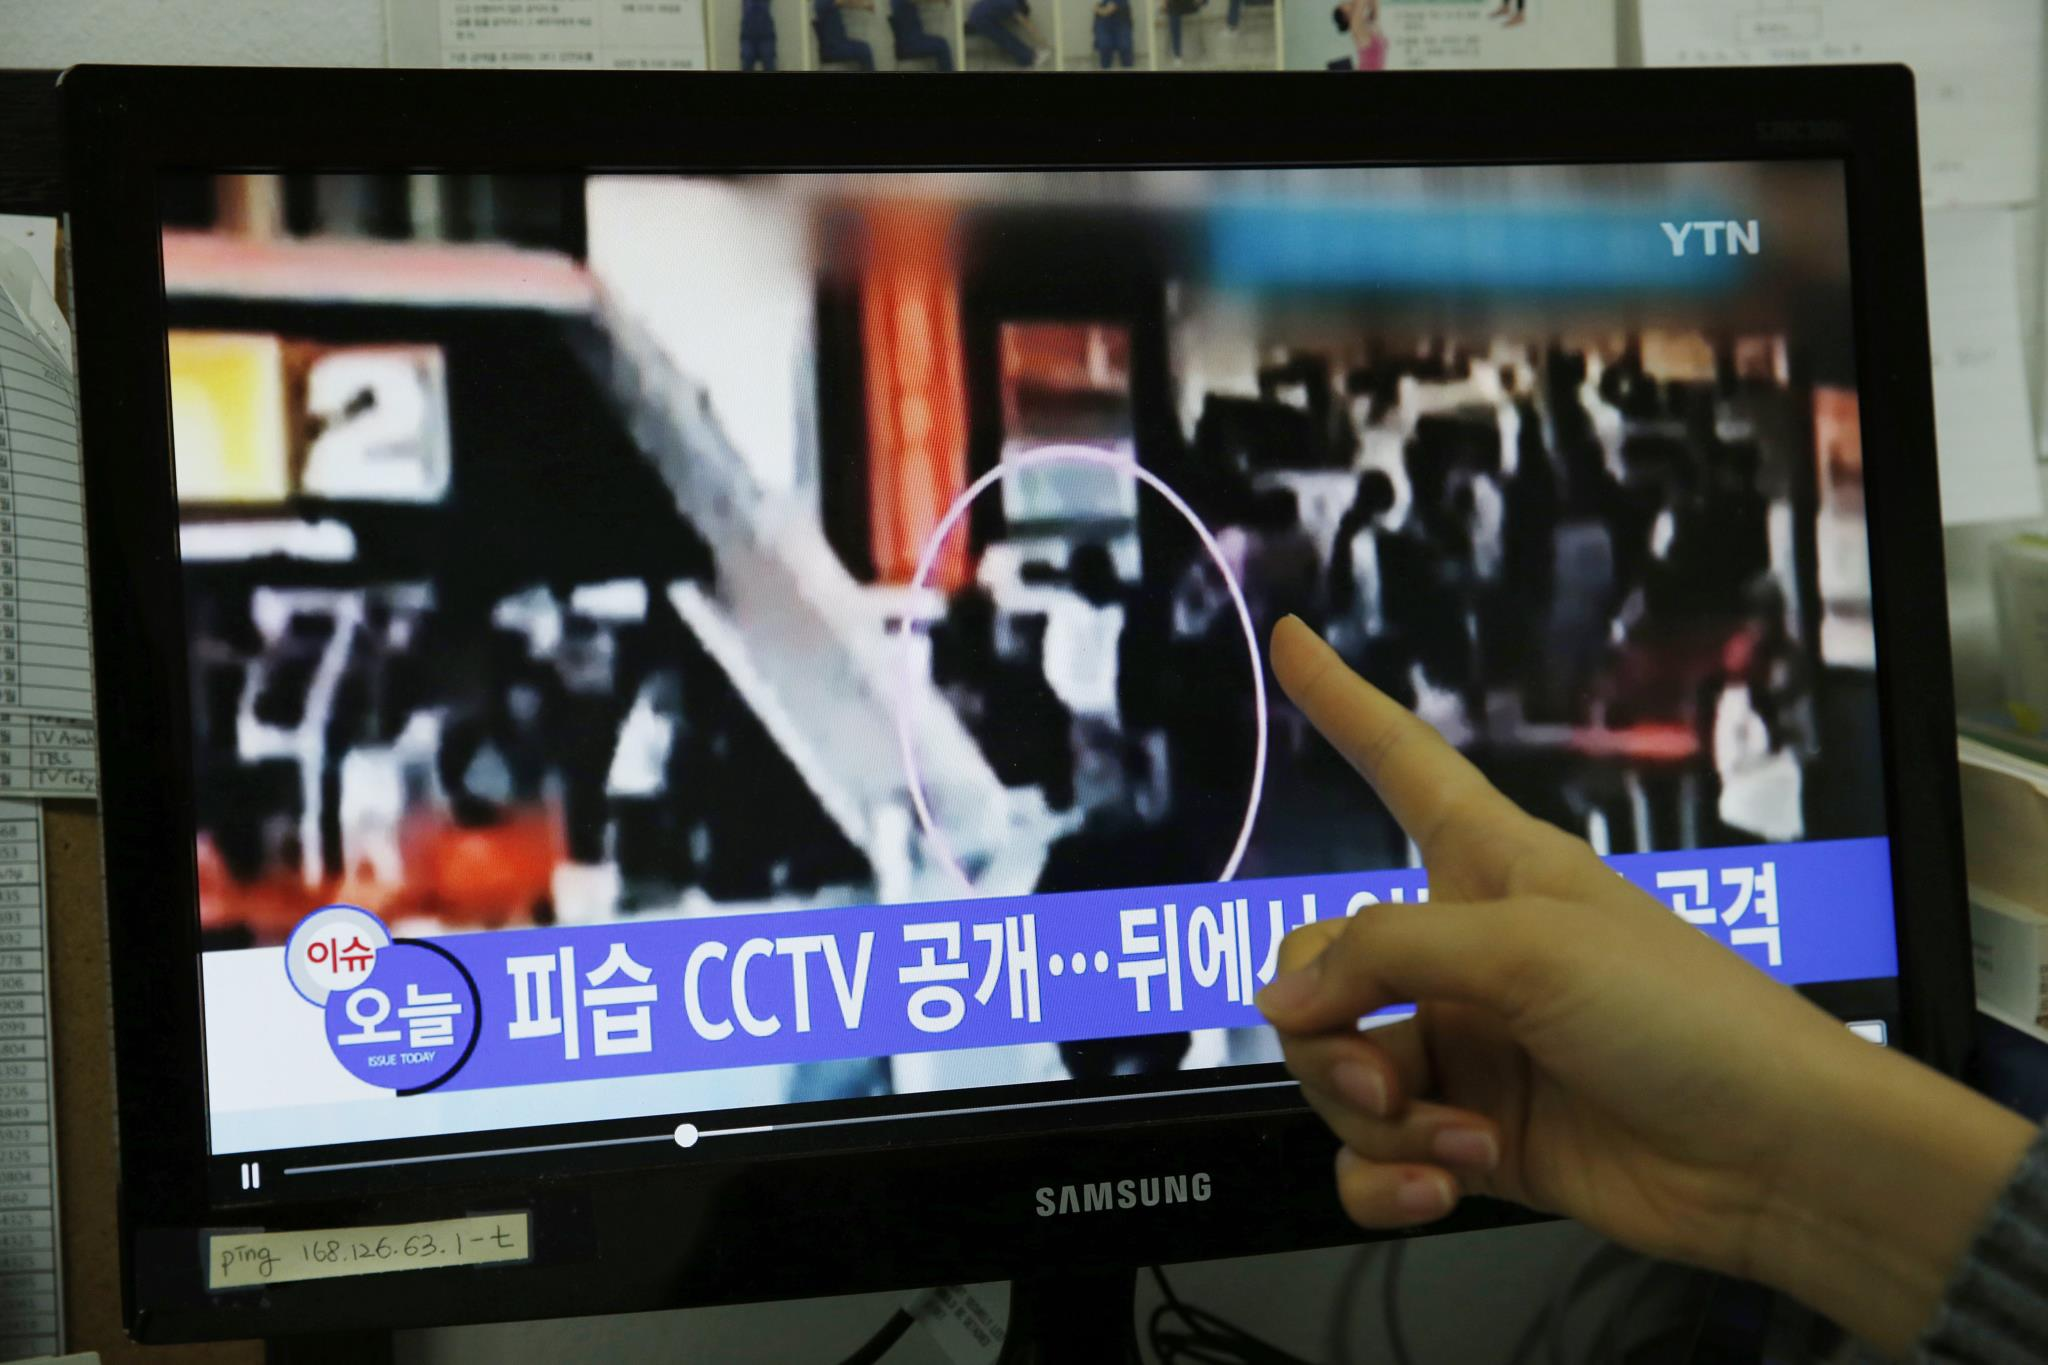 PÚBLICO - O que é o VX, a arma que matou o irmão de Kim Jong-un?